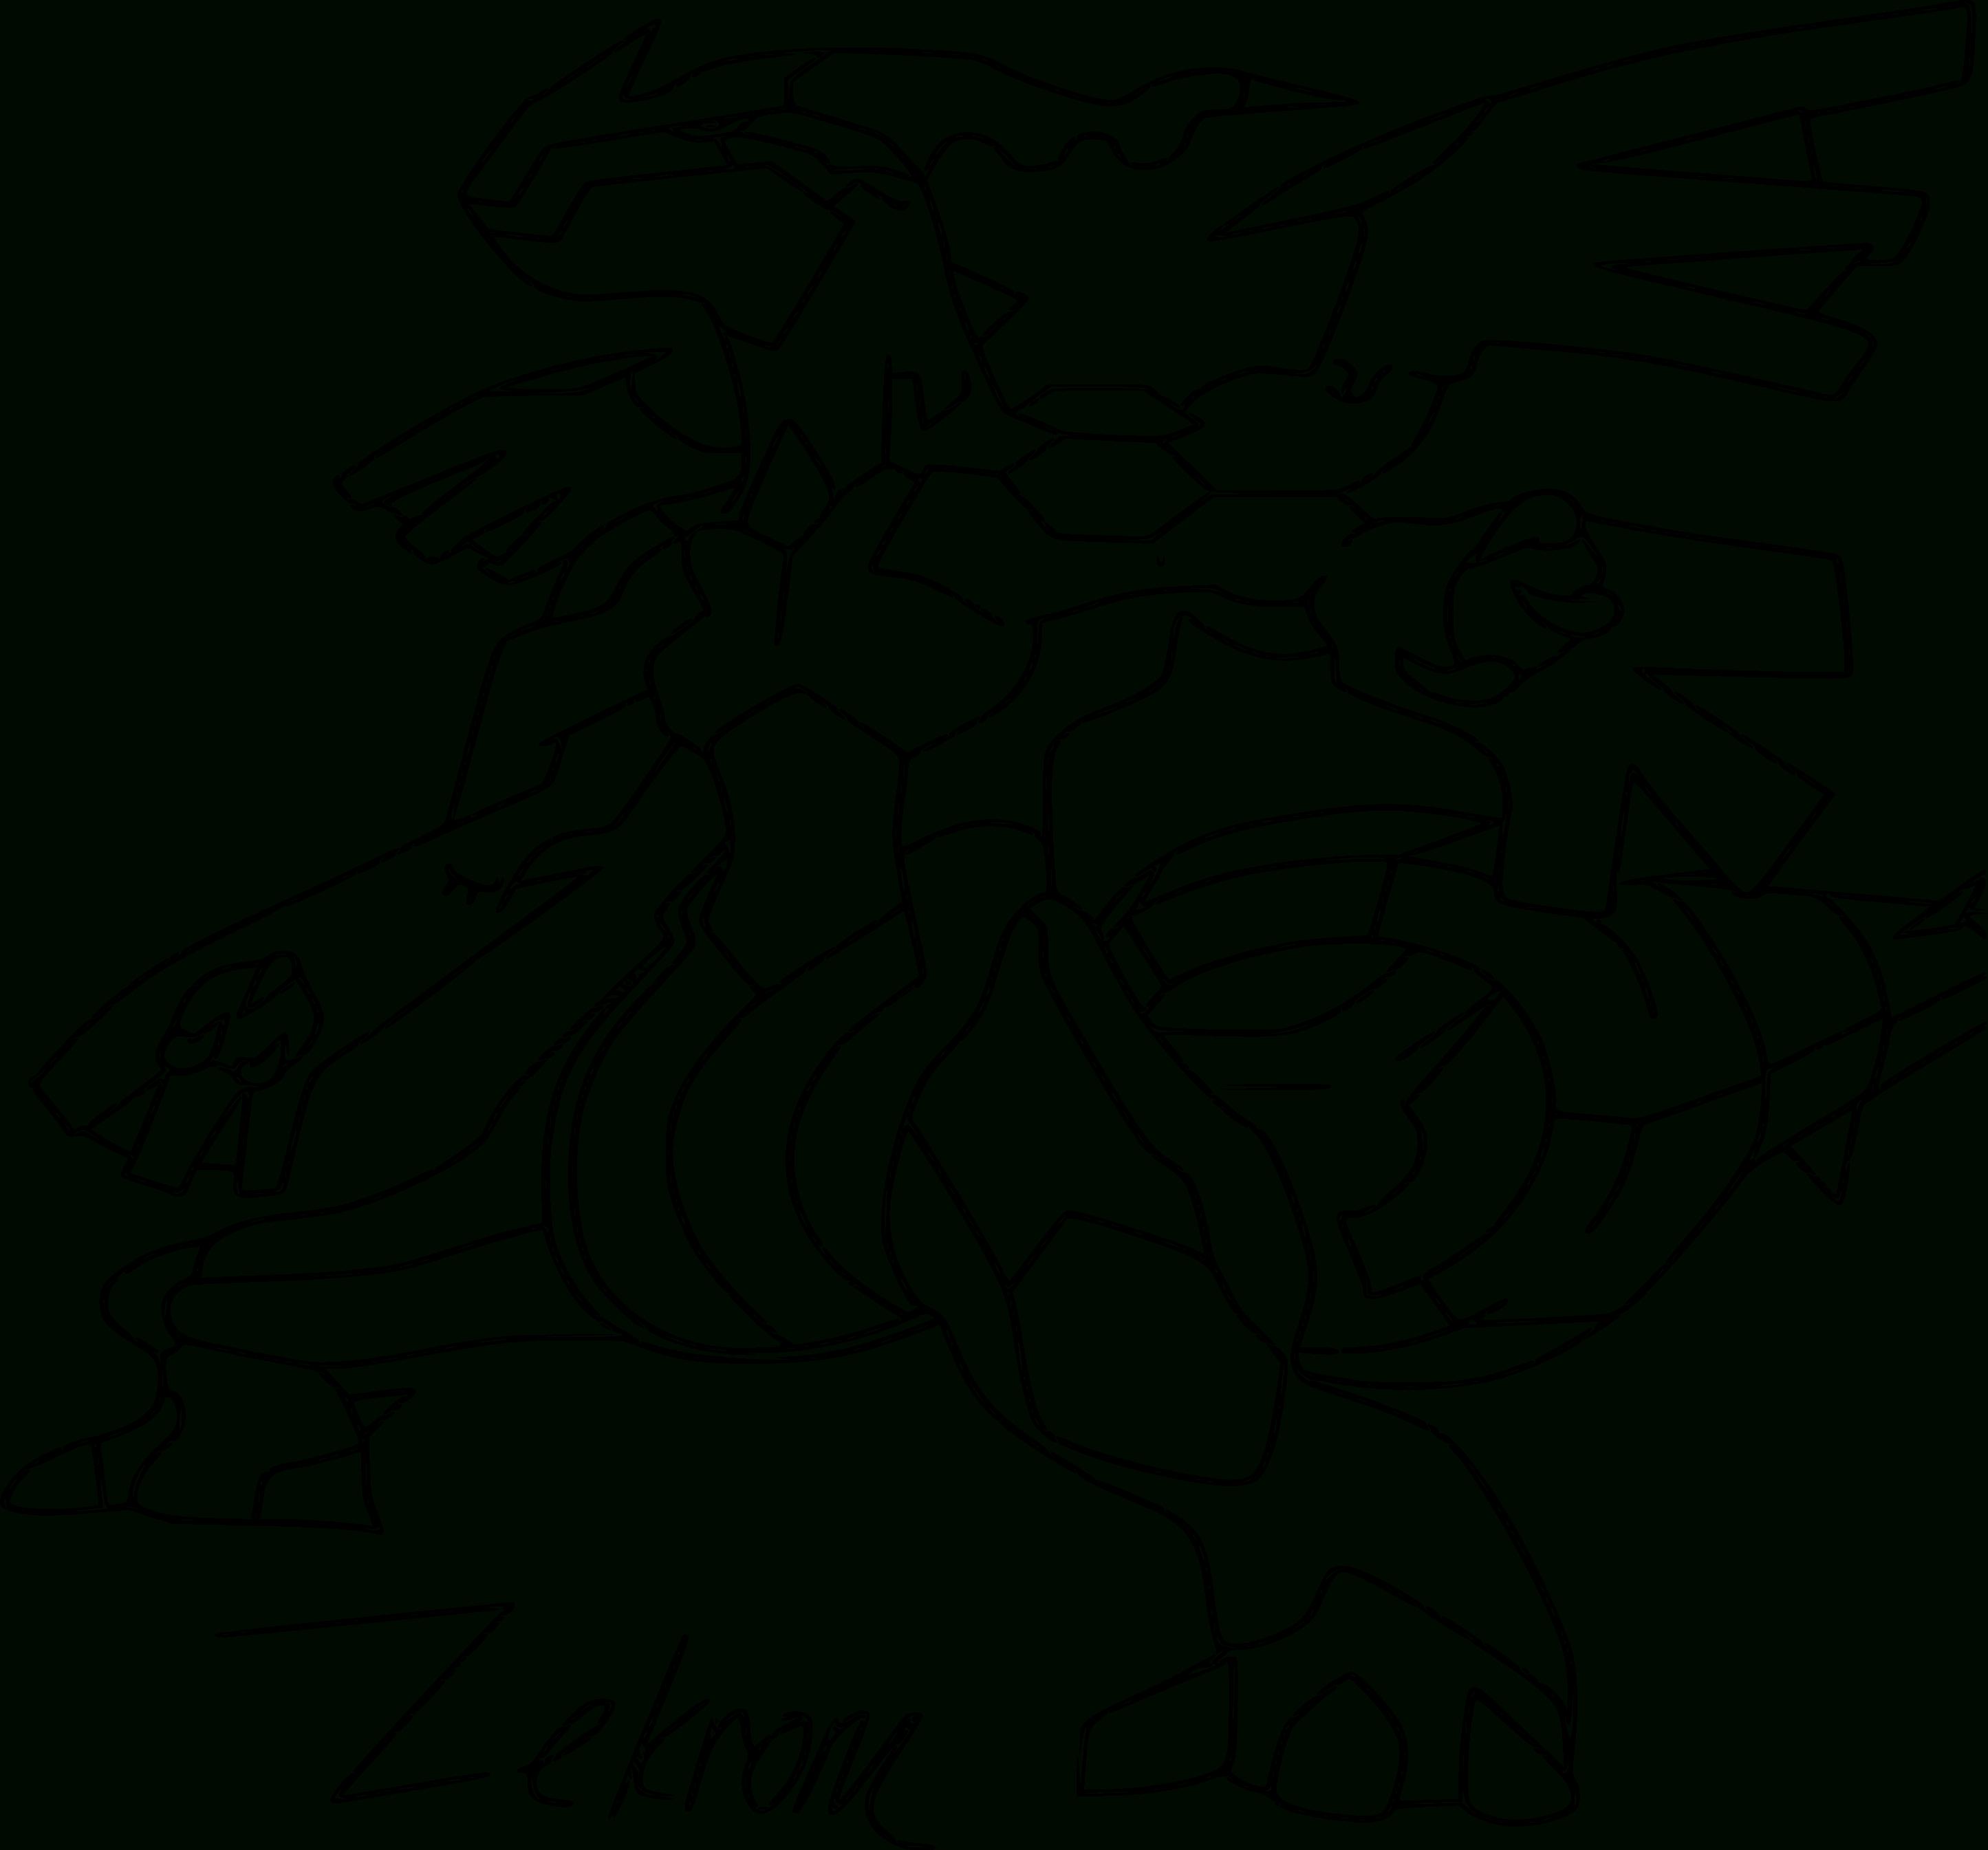 Zekrom : Coloriage Du Pokemon Zekrom À Imprimer Et Colorier concernant Coloriage De Pokemon A Imprimer